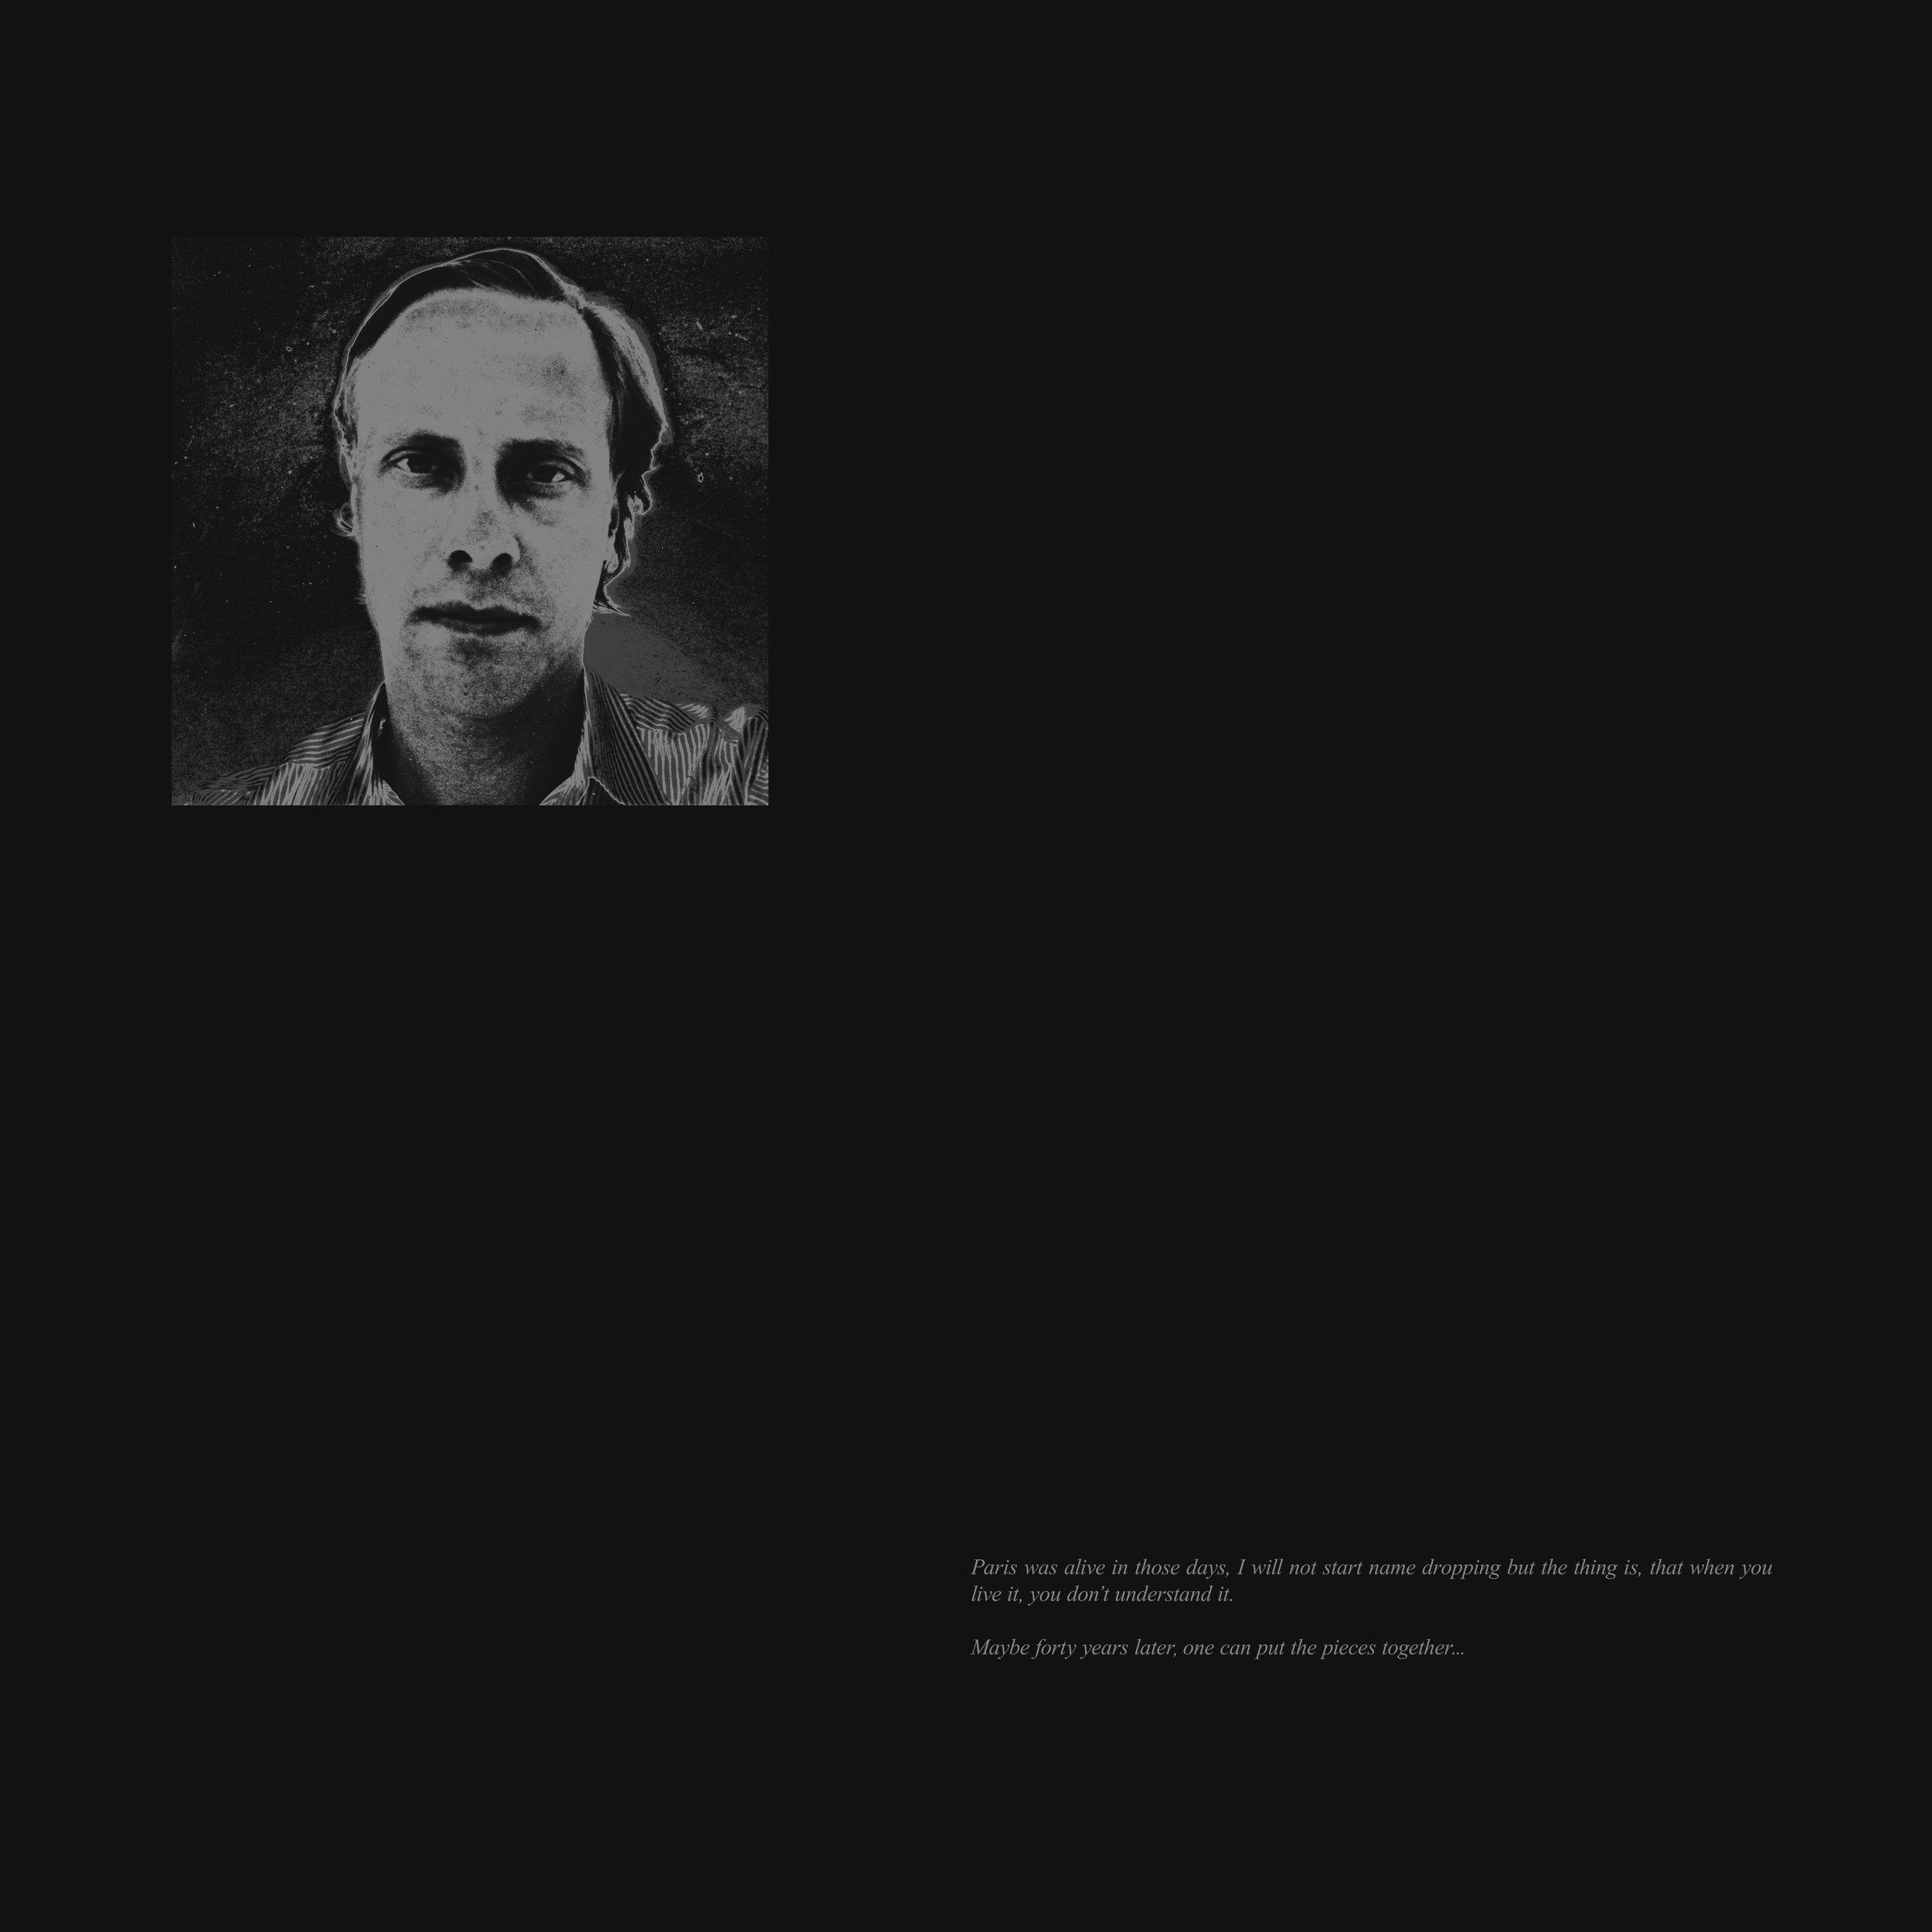 Ragnar_Grippe - Symphonic_Songs - DIAS126 - inner sleeve A.jpg